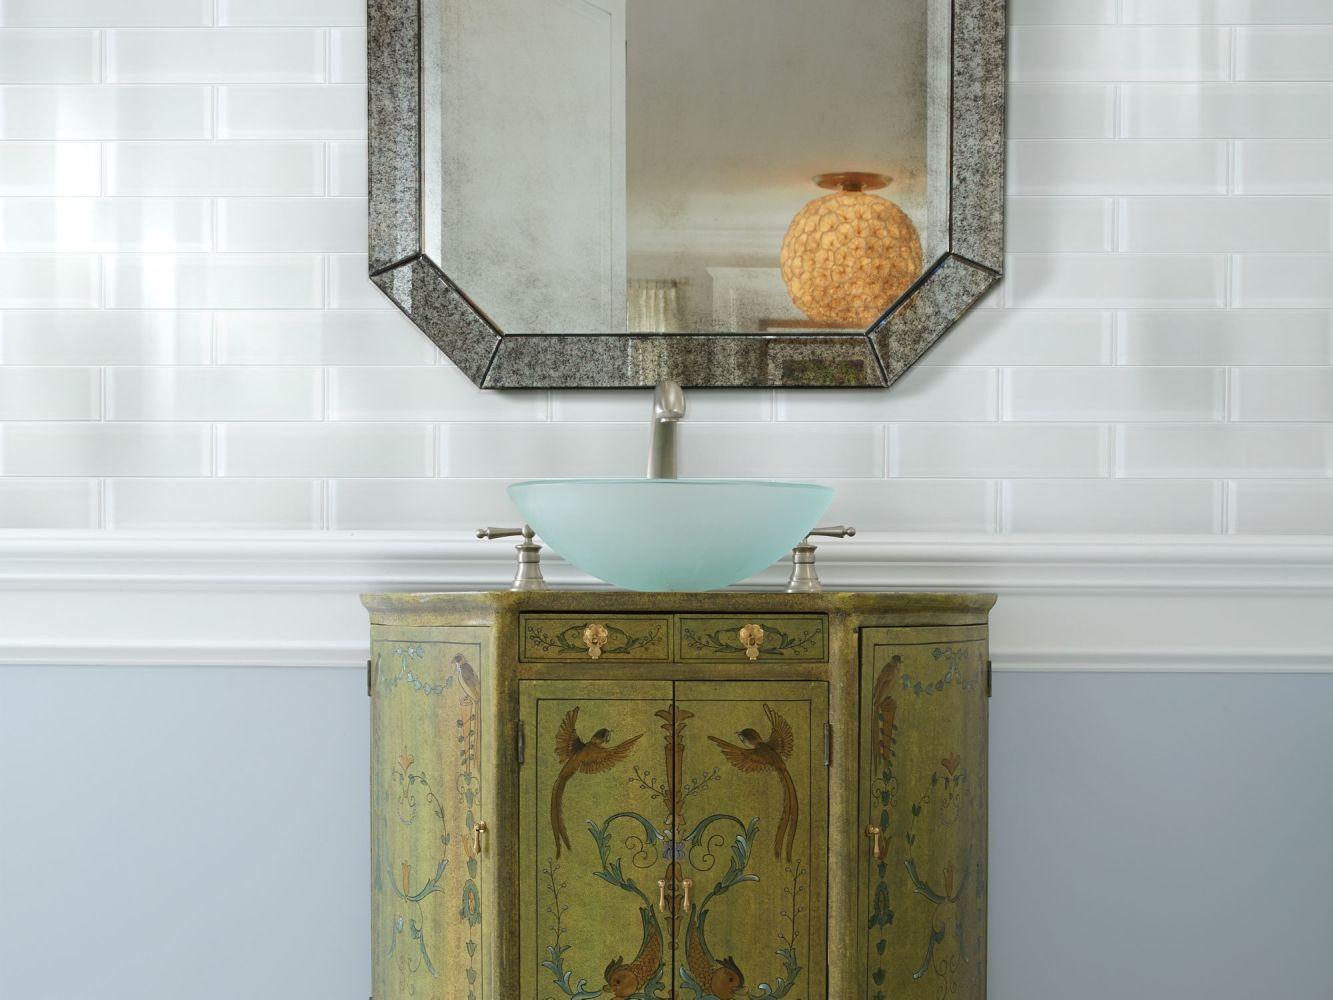 Shaw Floors Home Fn Gold Ceramic Principal 3×12 Glass Tile 2 Ice 00100_TG74B